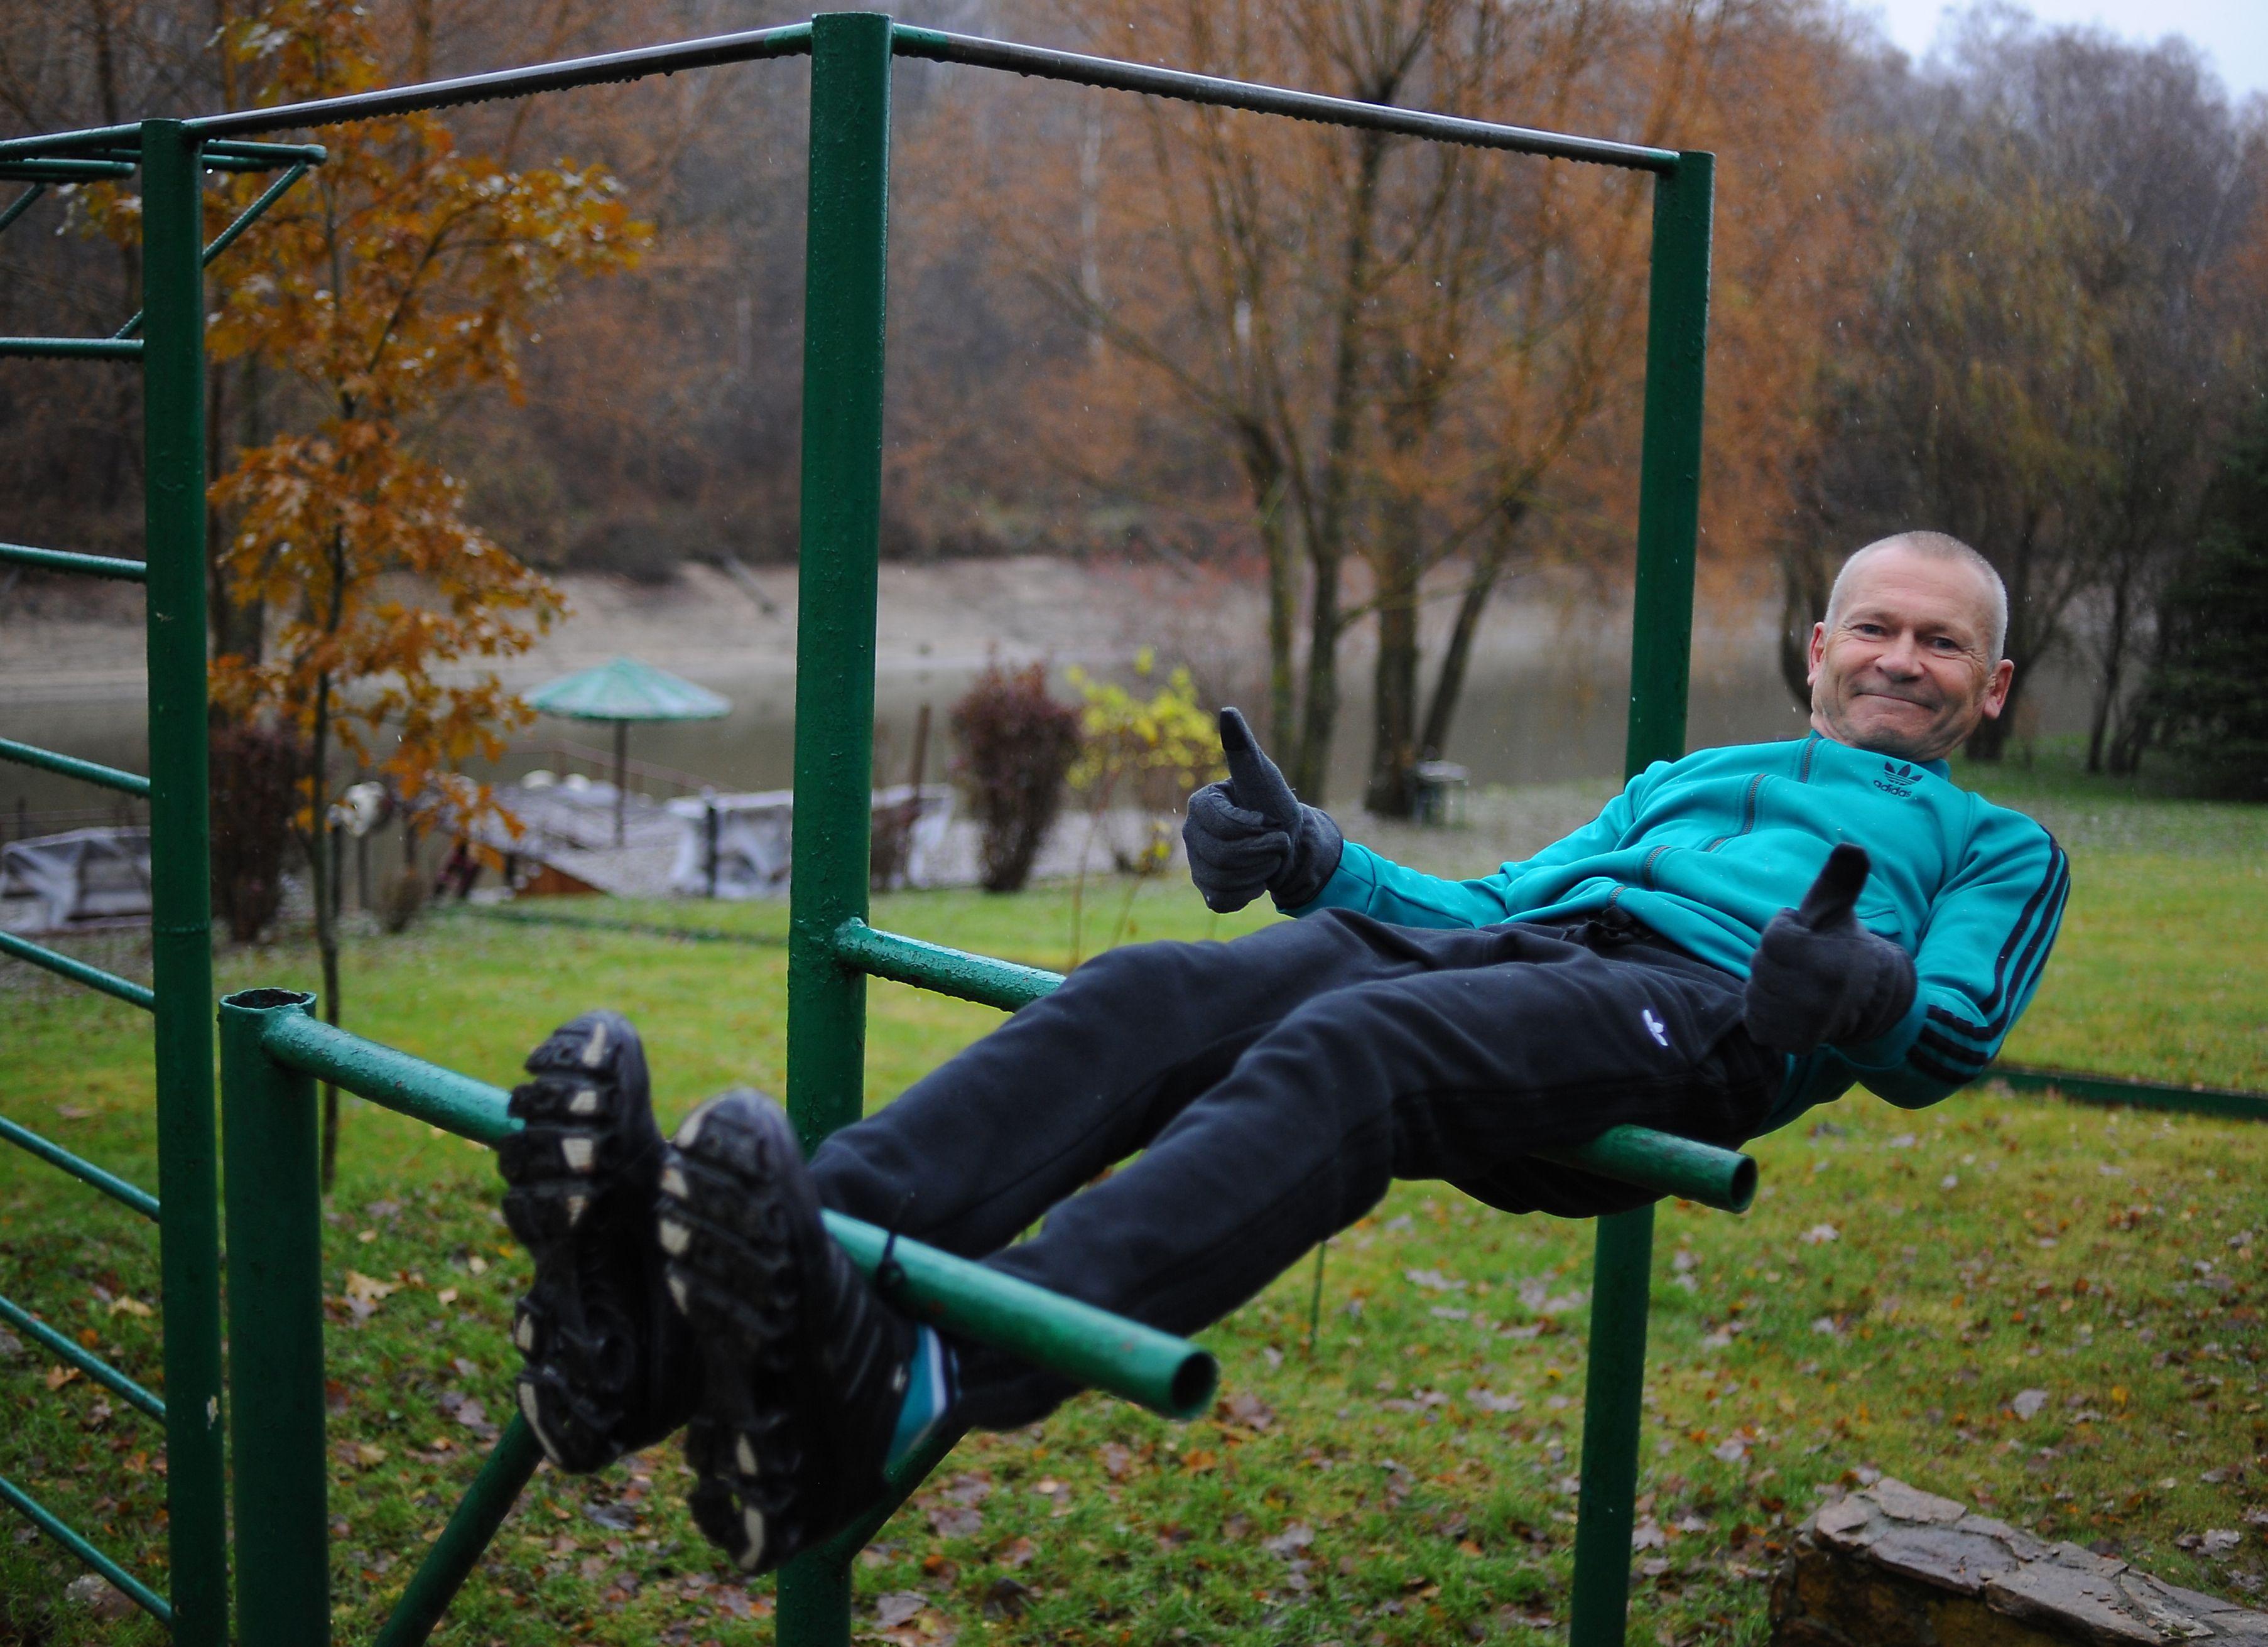 Фитнес-зарядку проведут в Орехове-Борисове Южном